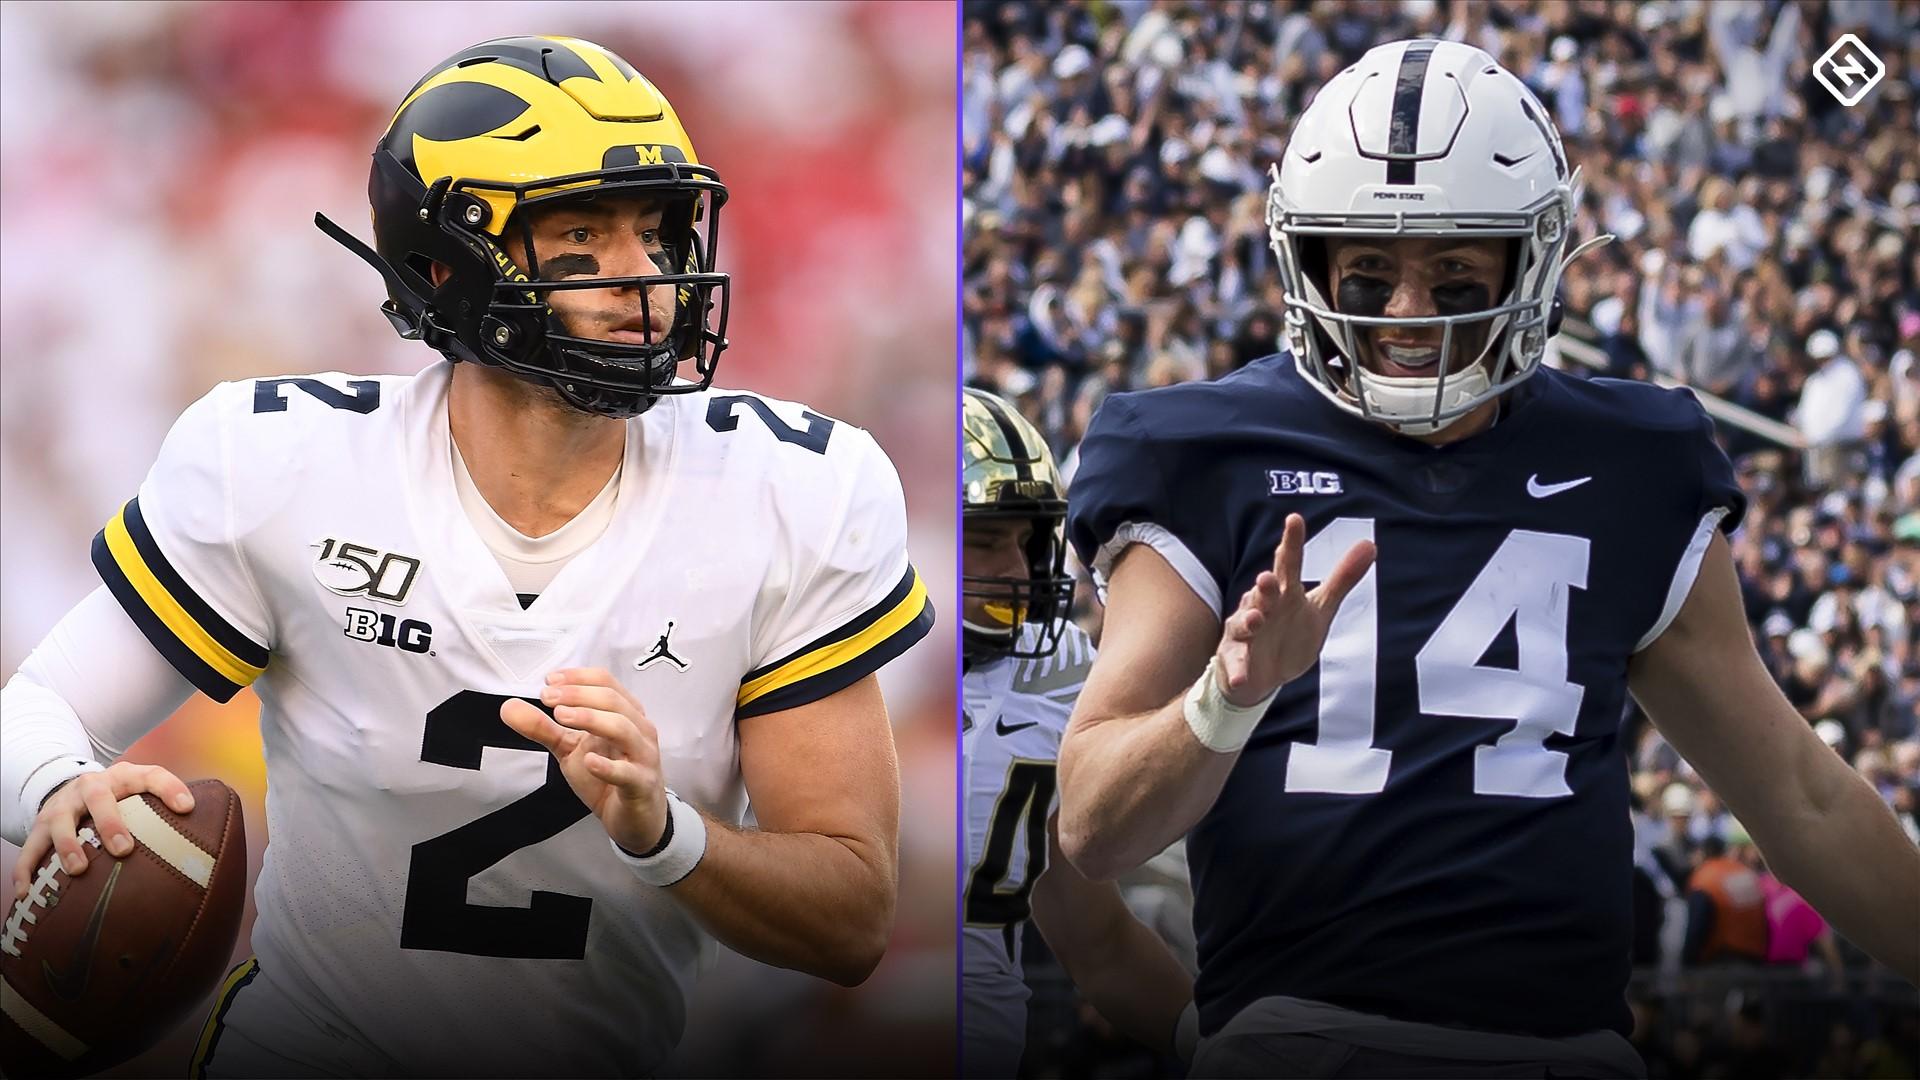 College football picks, Week 8: Michigan, Penn State jockey for position in Big Ten East